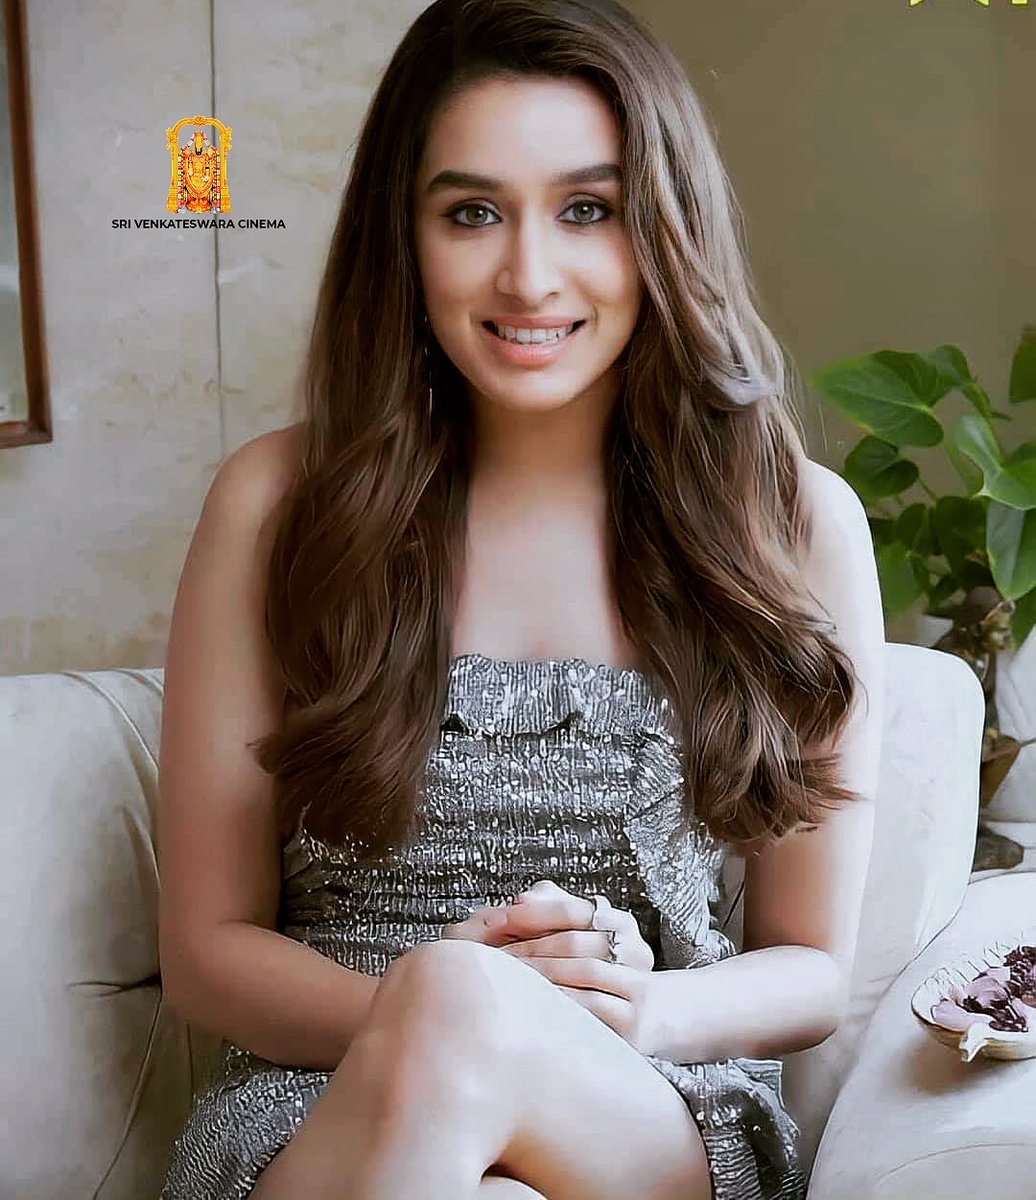 Cute Angel 💞 @ShraddhaKapoor  #ShraddhaKapoor #shraddha #Bollywood #bollywoodnews #bollywoodactress #BollywoodBreaking #bollywoodhot #bollywoodbeauty #bollywoodactor #bolly #bollywoodart #bollywoodcelebrity #bollywoodhungama #bollywoodboxofficemasalanews #actress #actresses